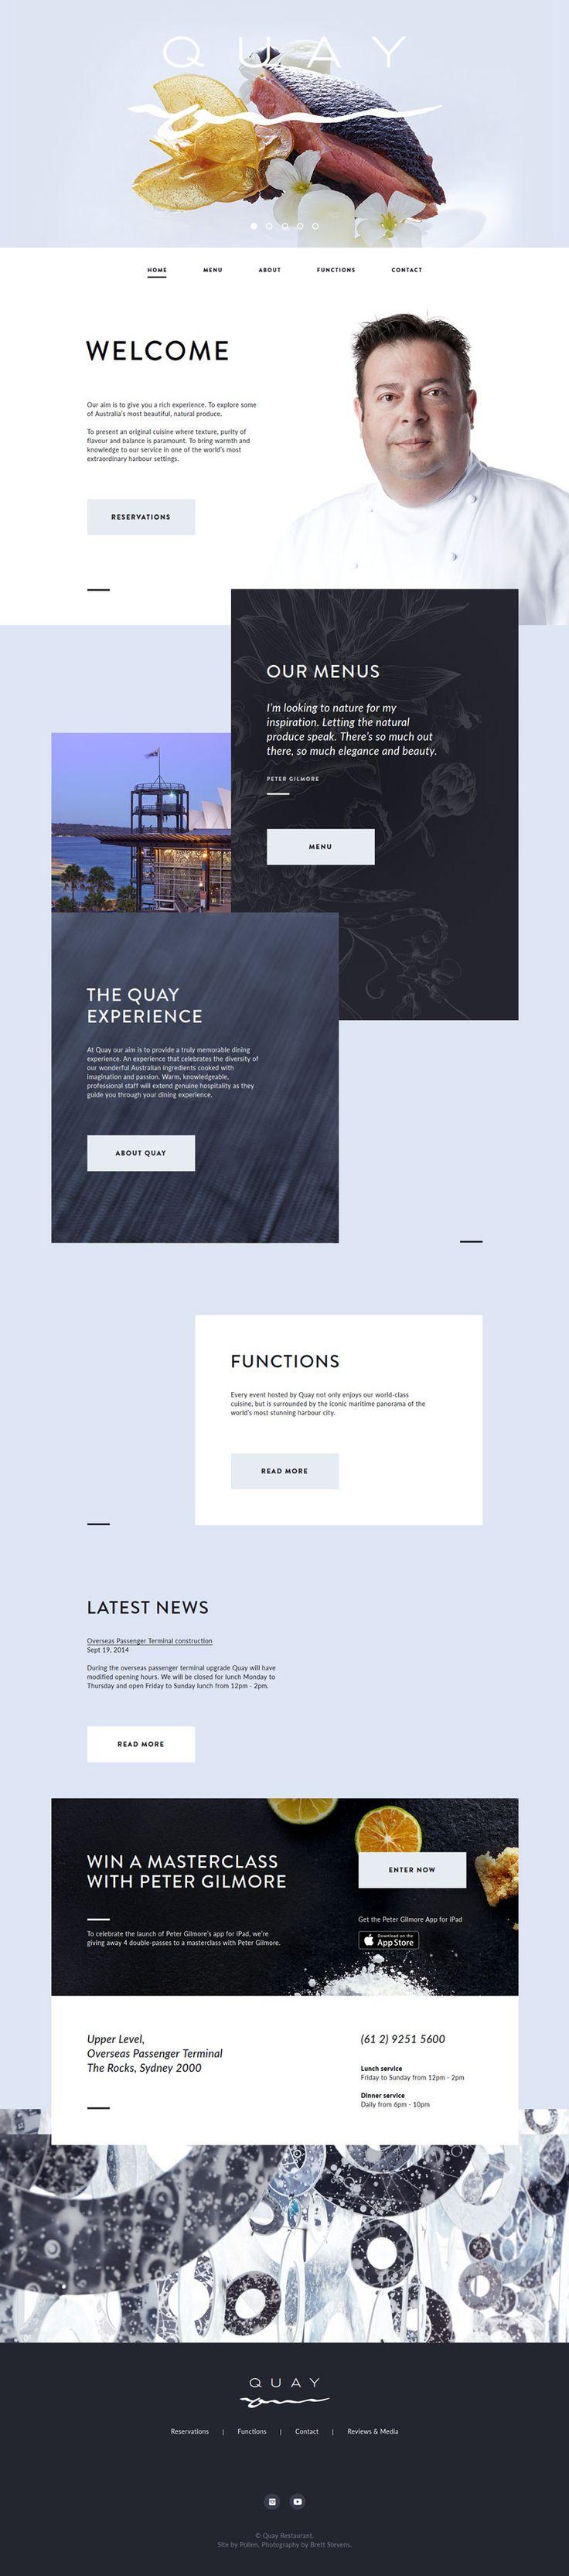 Creative Flat Design Website; Example; Category: Inspiration; Name Site: Quay; Type Website: Restaurant; Color: Blue, Light Blue.